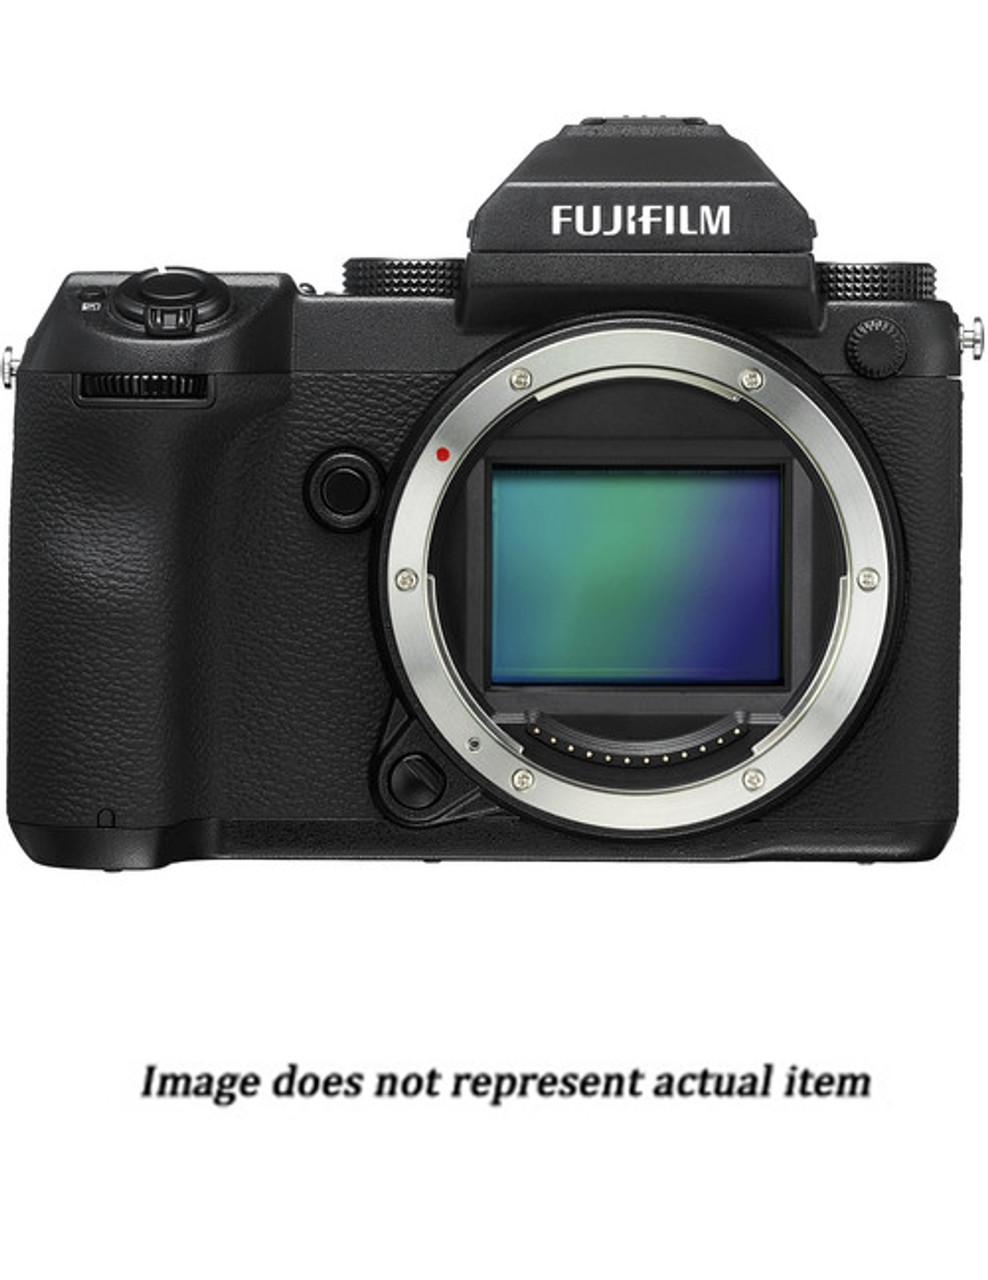 Fujifilm GFX 50S Medium Format Mirrorless Camera Body (USED) - S/N 74005408